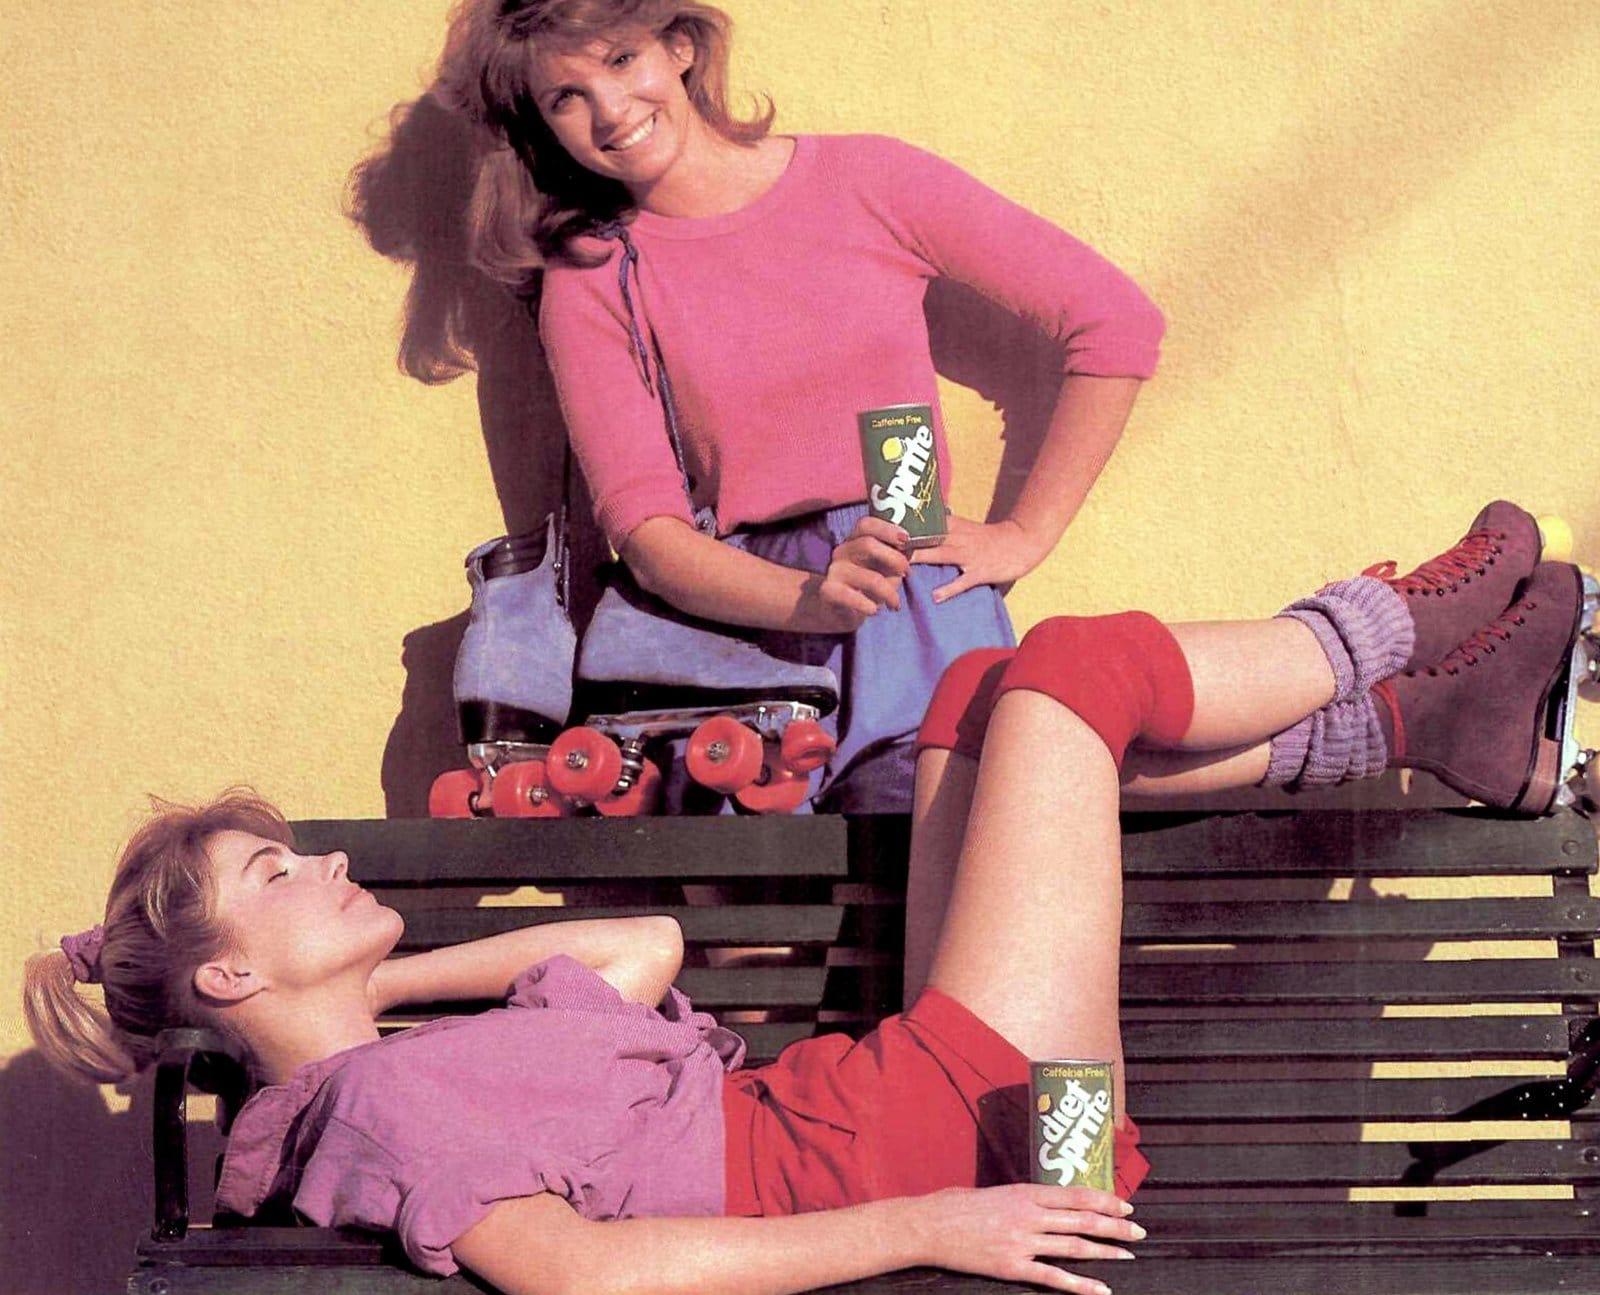 Trendy eighties girls roller skate with Sprite (1985)